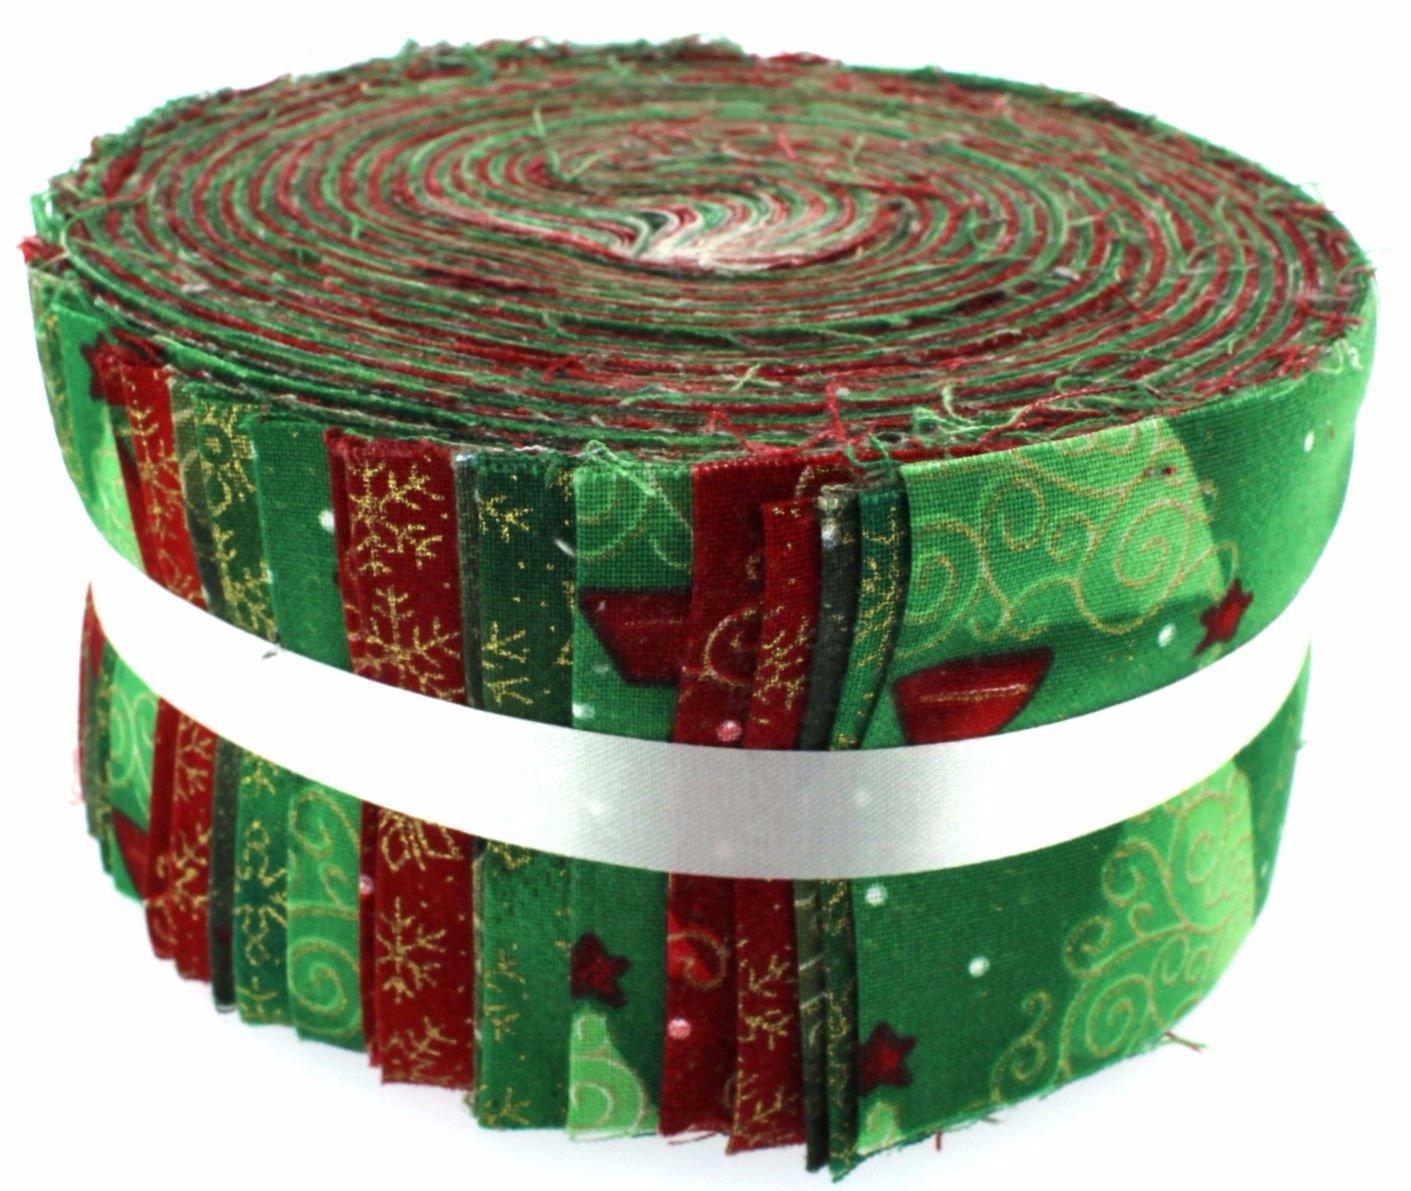 Fabric Freedom Under The Christmas Tree Roll, 100% Cotton, Multicoloured, 13 x 13 x 7 cm FJ503